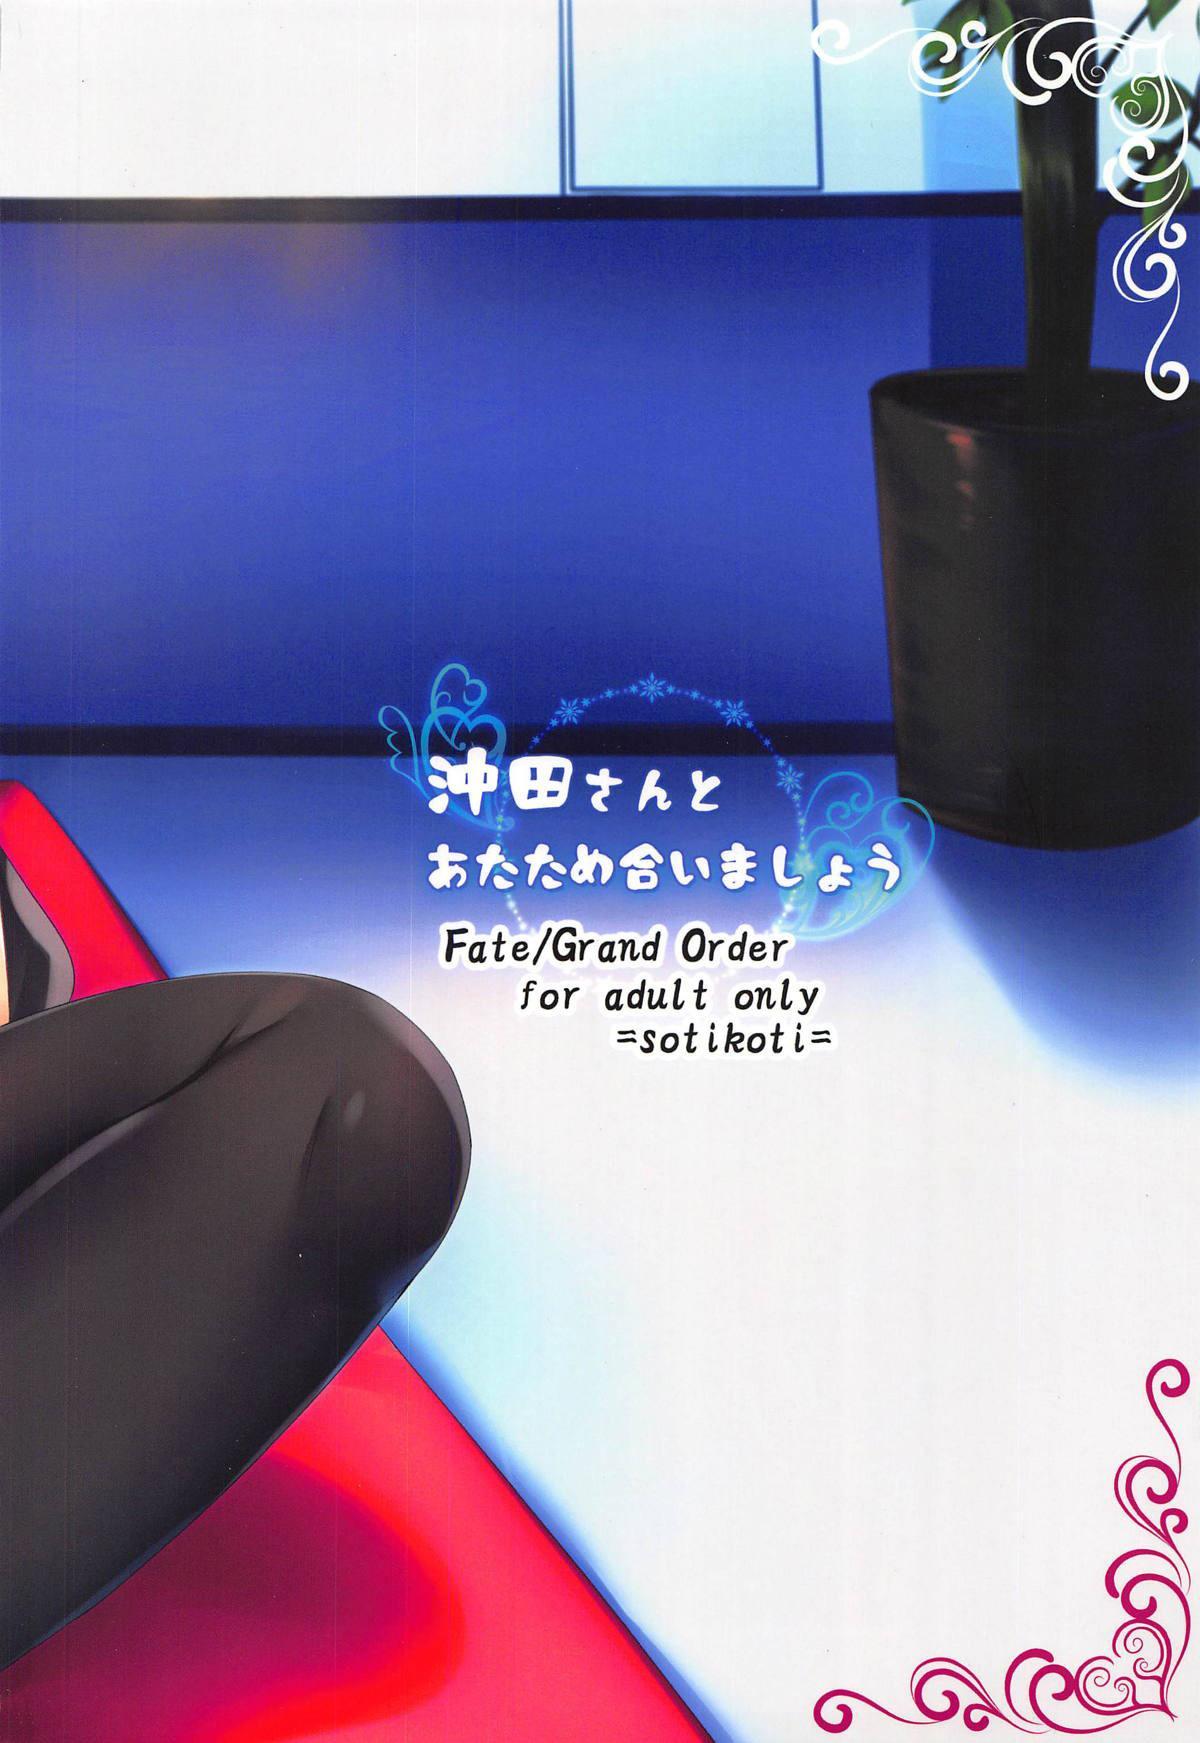 (C95) [SOTIKOTI (soramoti)] Okita-san to Atatameaimashou | Warming Up With Okita-san (Fate/Grand Order) [English] {Doujins.com} [Incomplete] 19